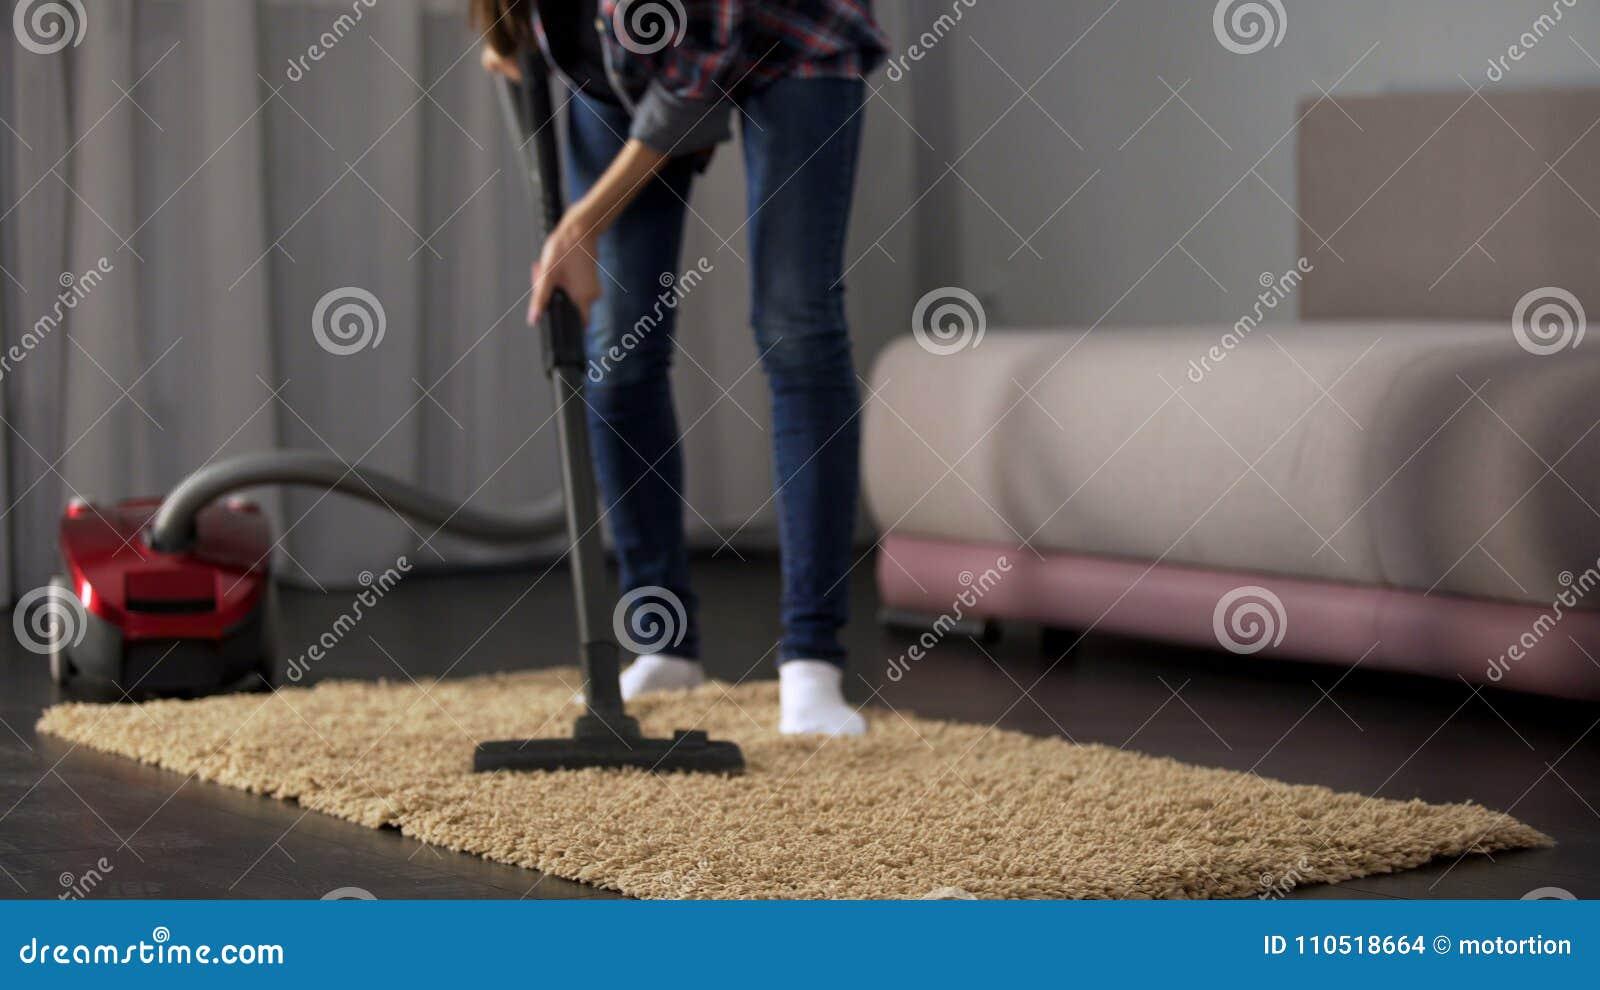 Tapete hoovering fêmea da sala durante a limpeza geral, funcionamento da casa, limpeza